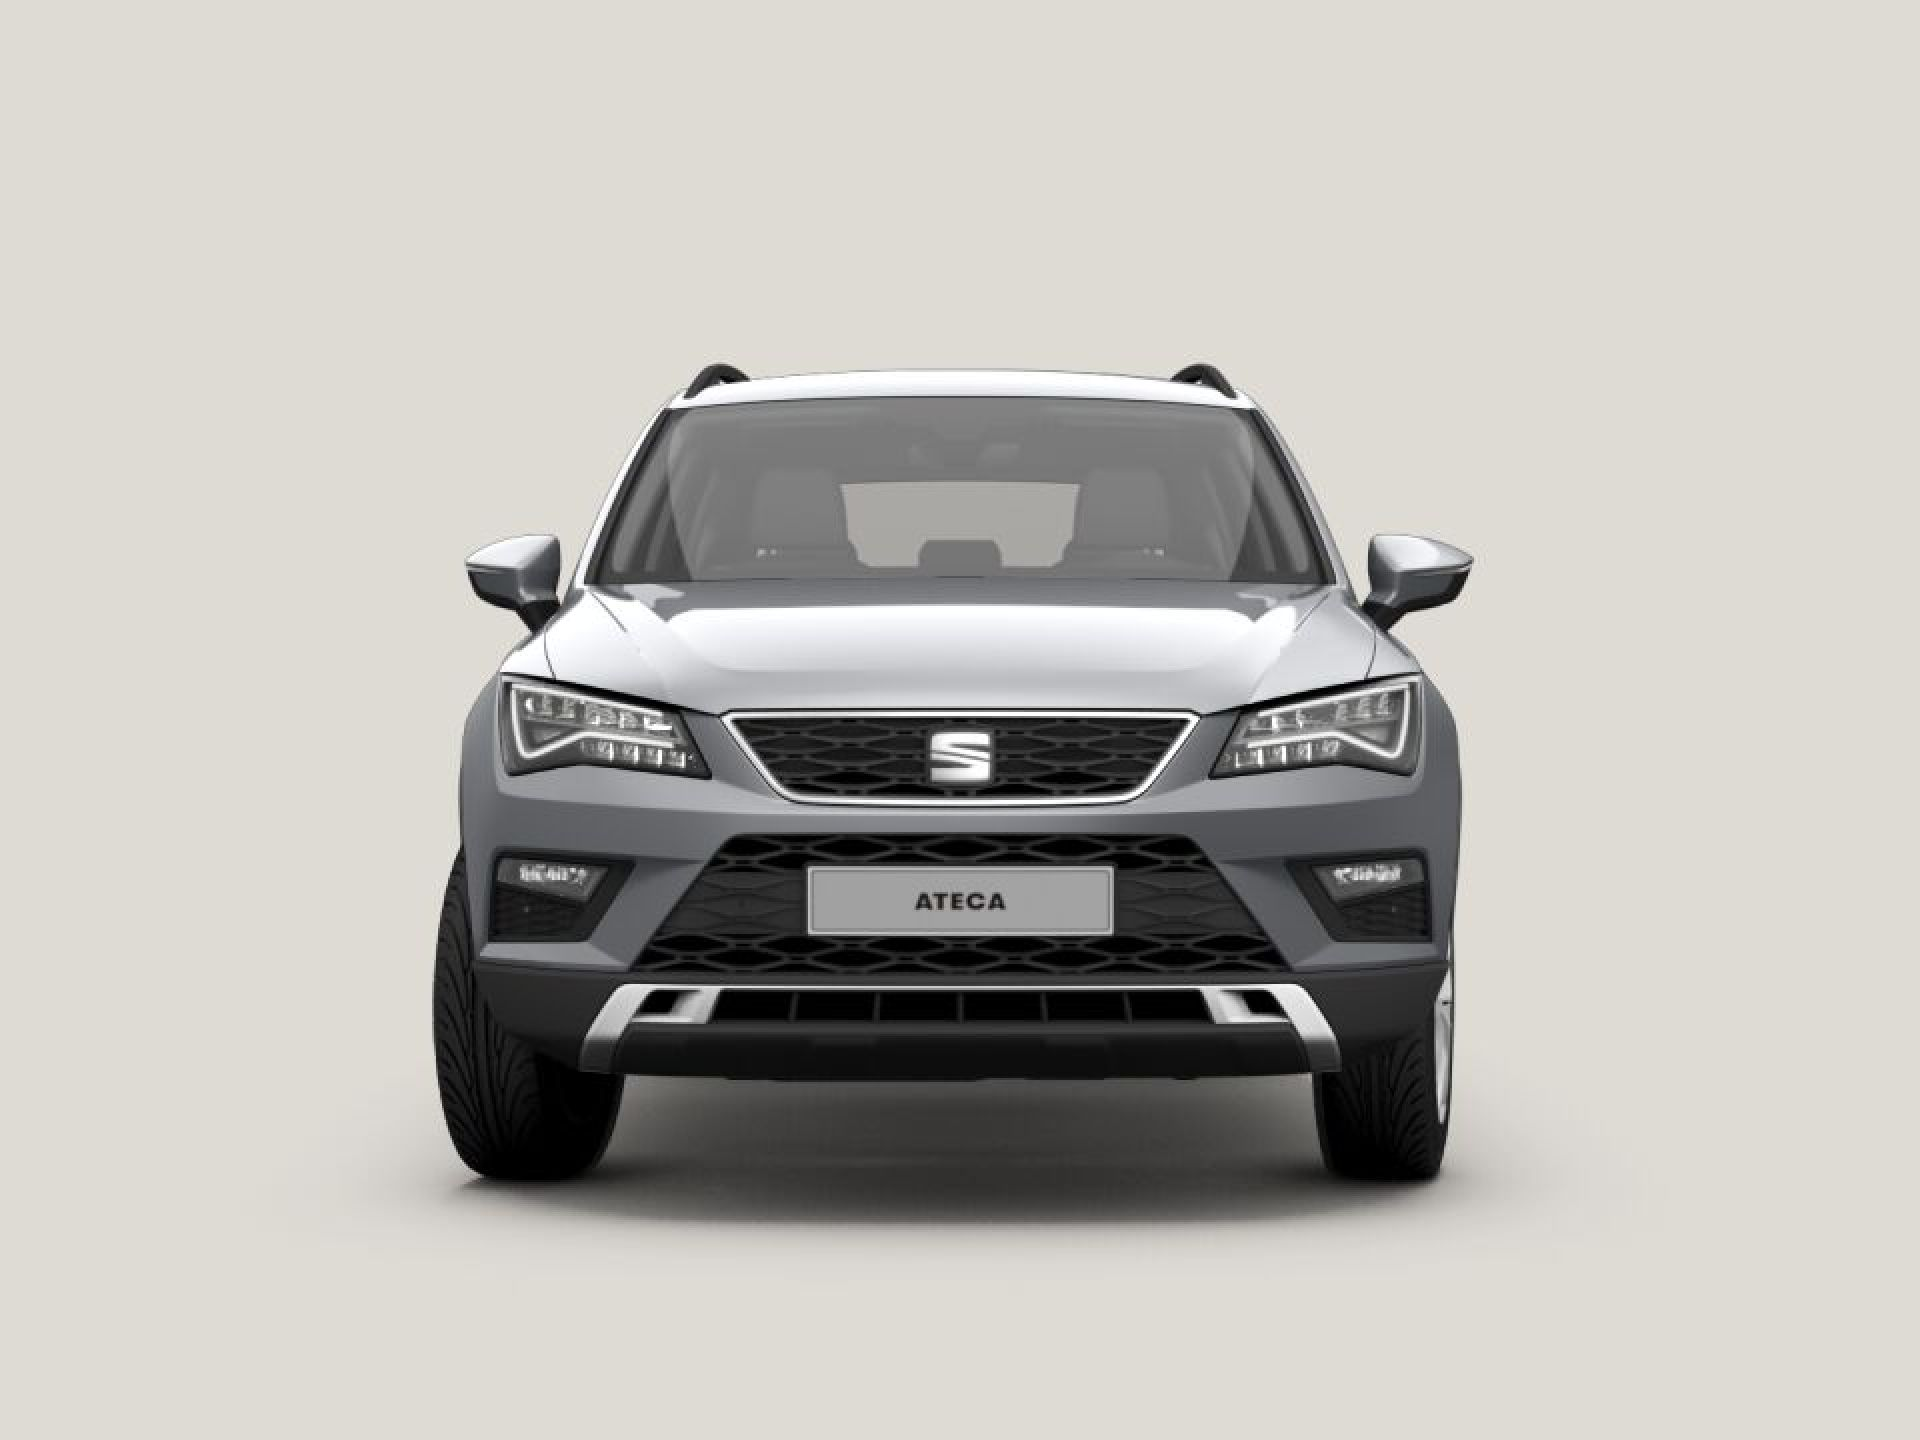 SEAT Ateca 2.0 TDI 110kW (150CV) DSG S&S Style Edit nuevo Madrid